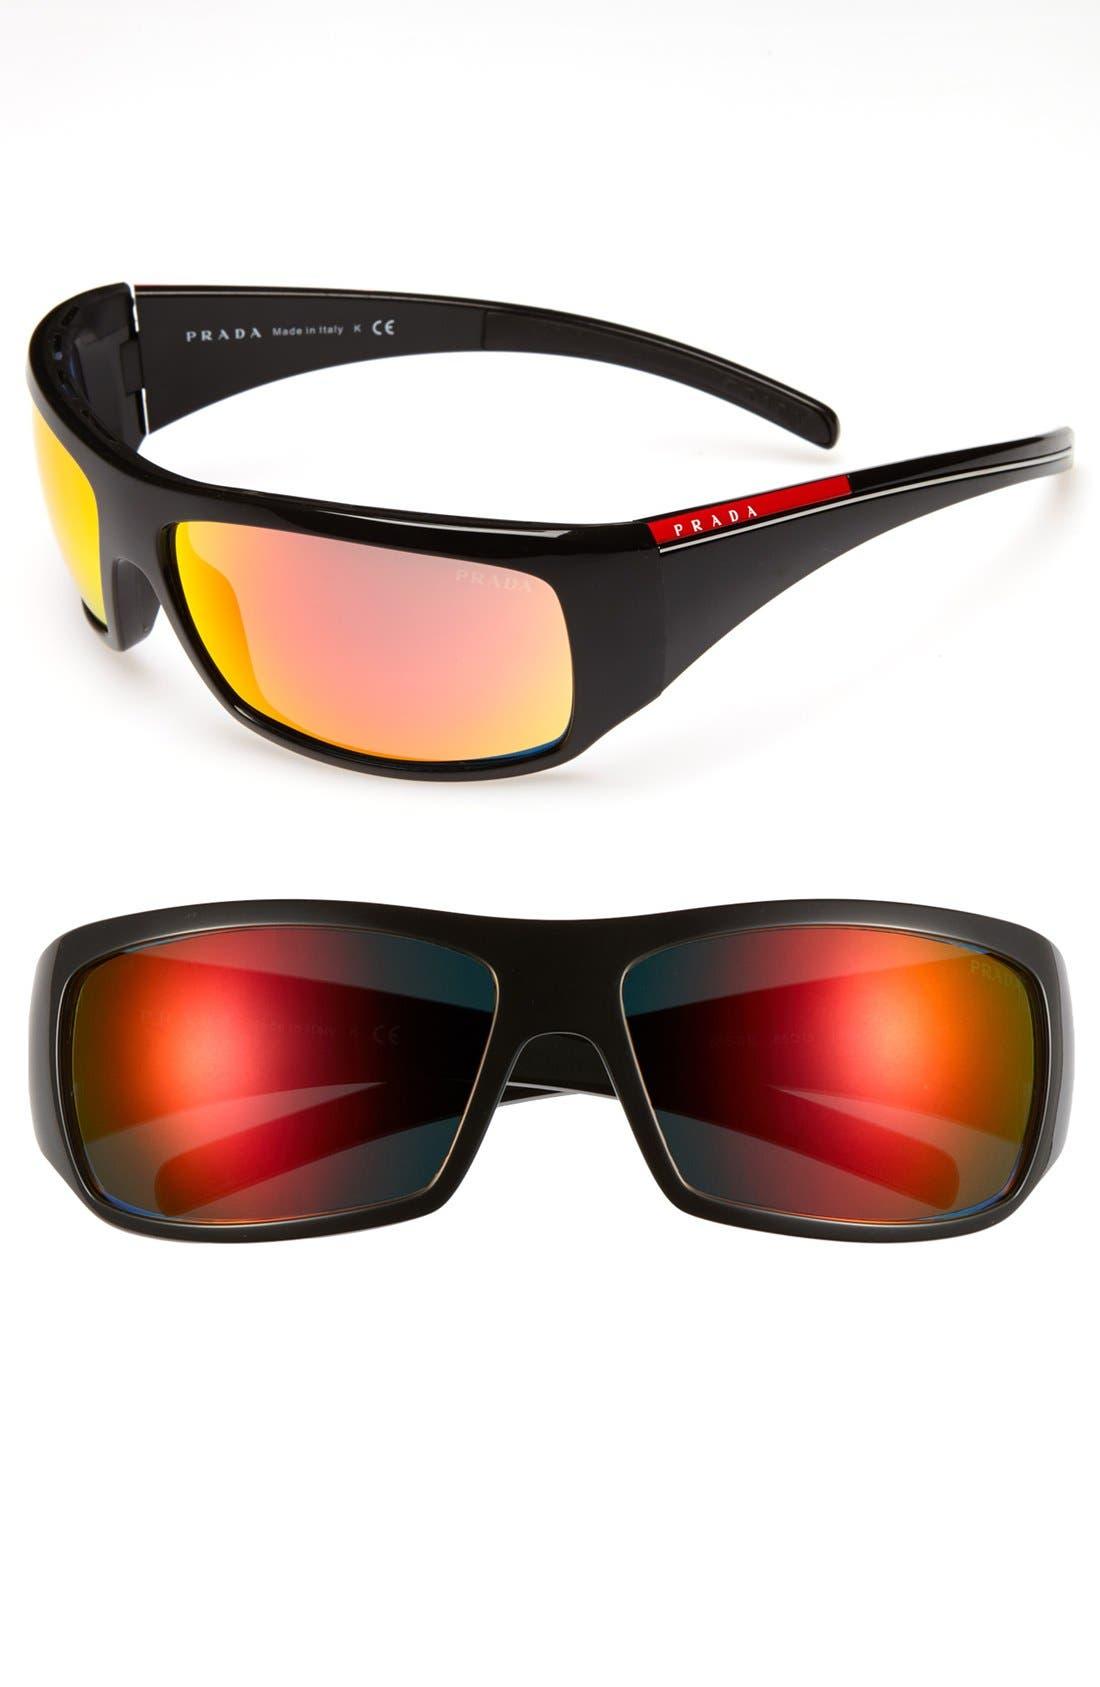 Alternate Image 1 Selected - Prada 65mm Wraparound Sunglasses